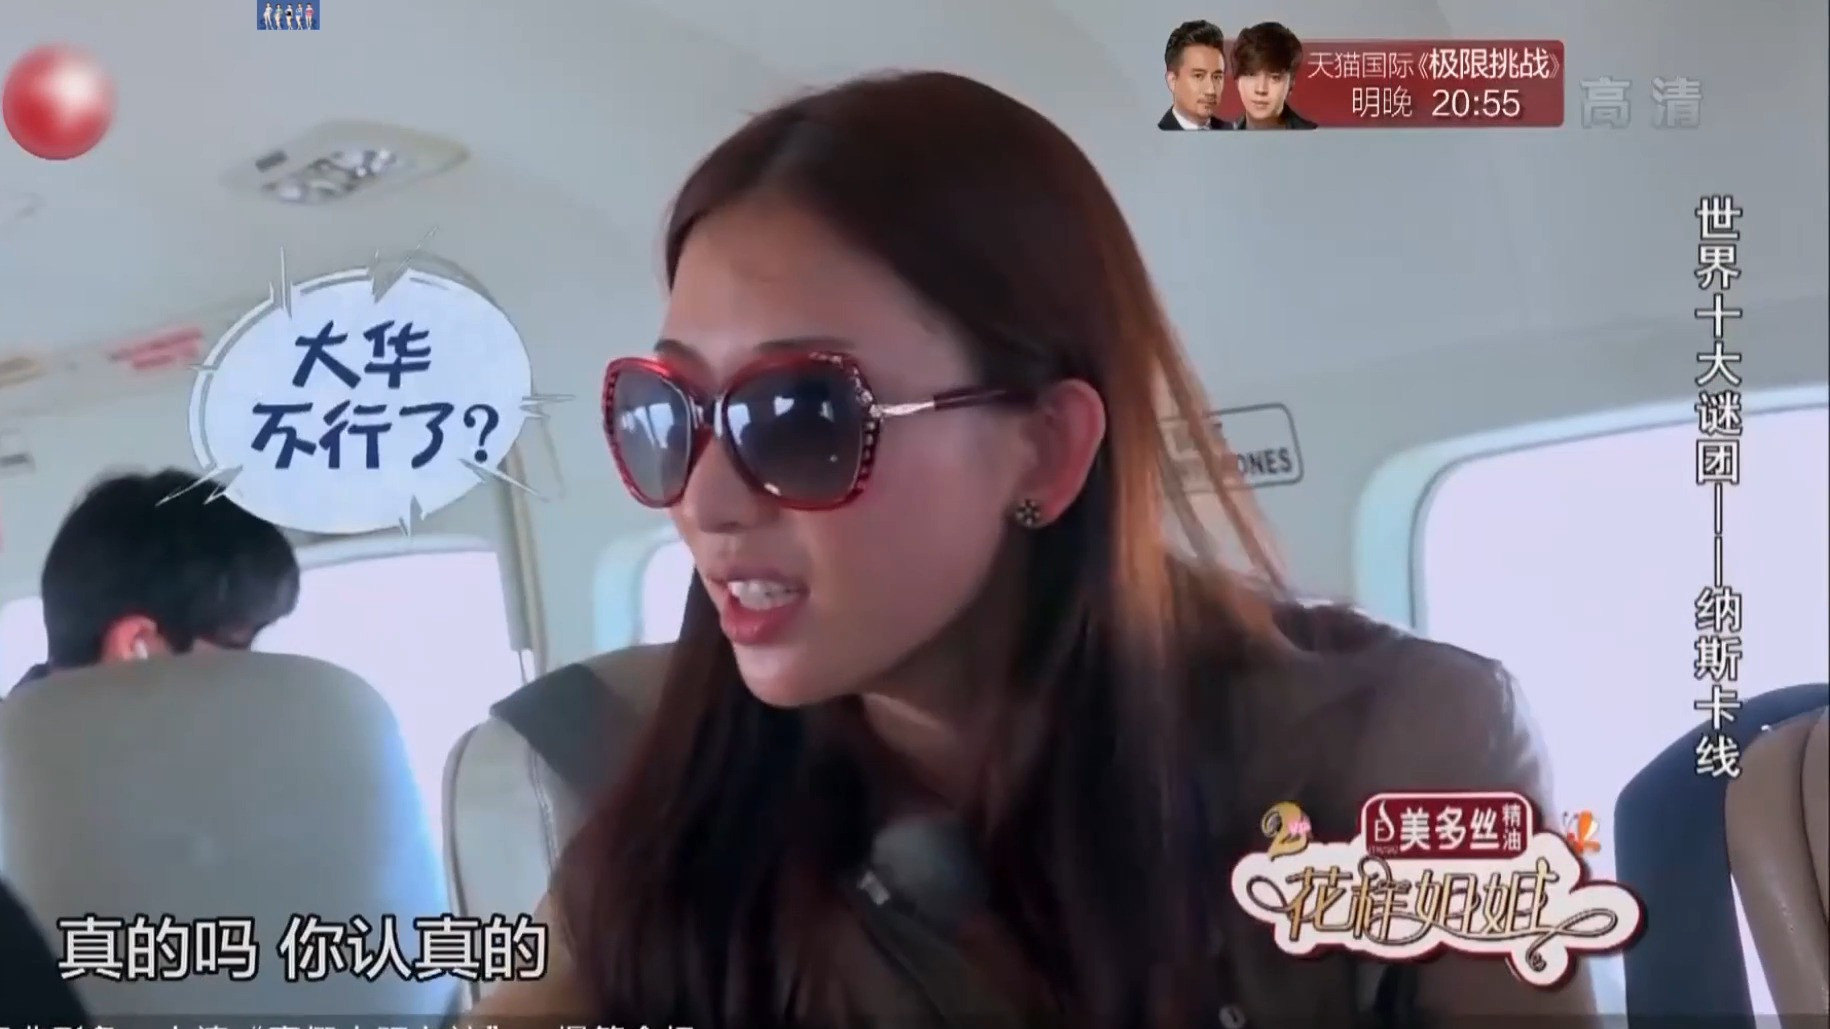 HY:大华飞机上假装呕吐,恶搞林志玲,女神立马反击!